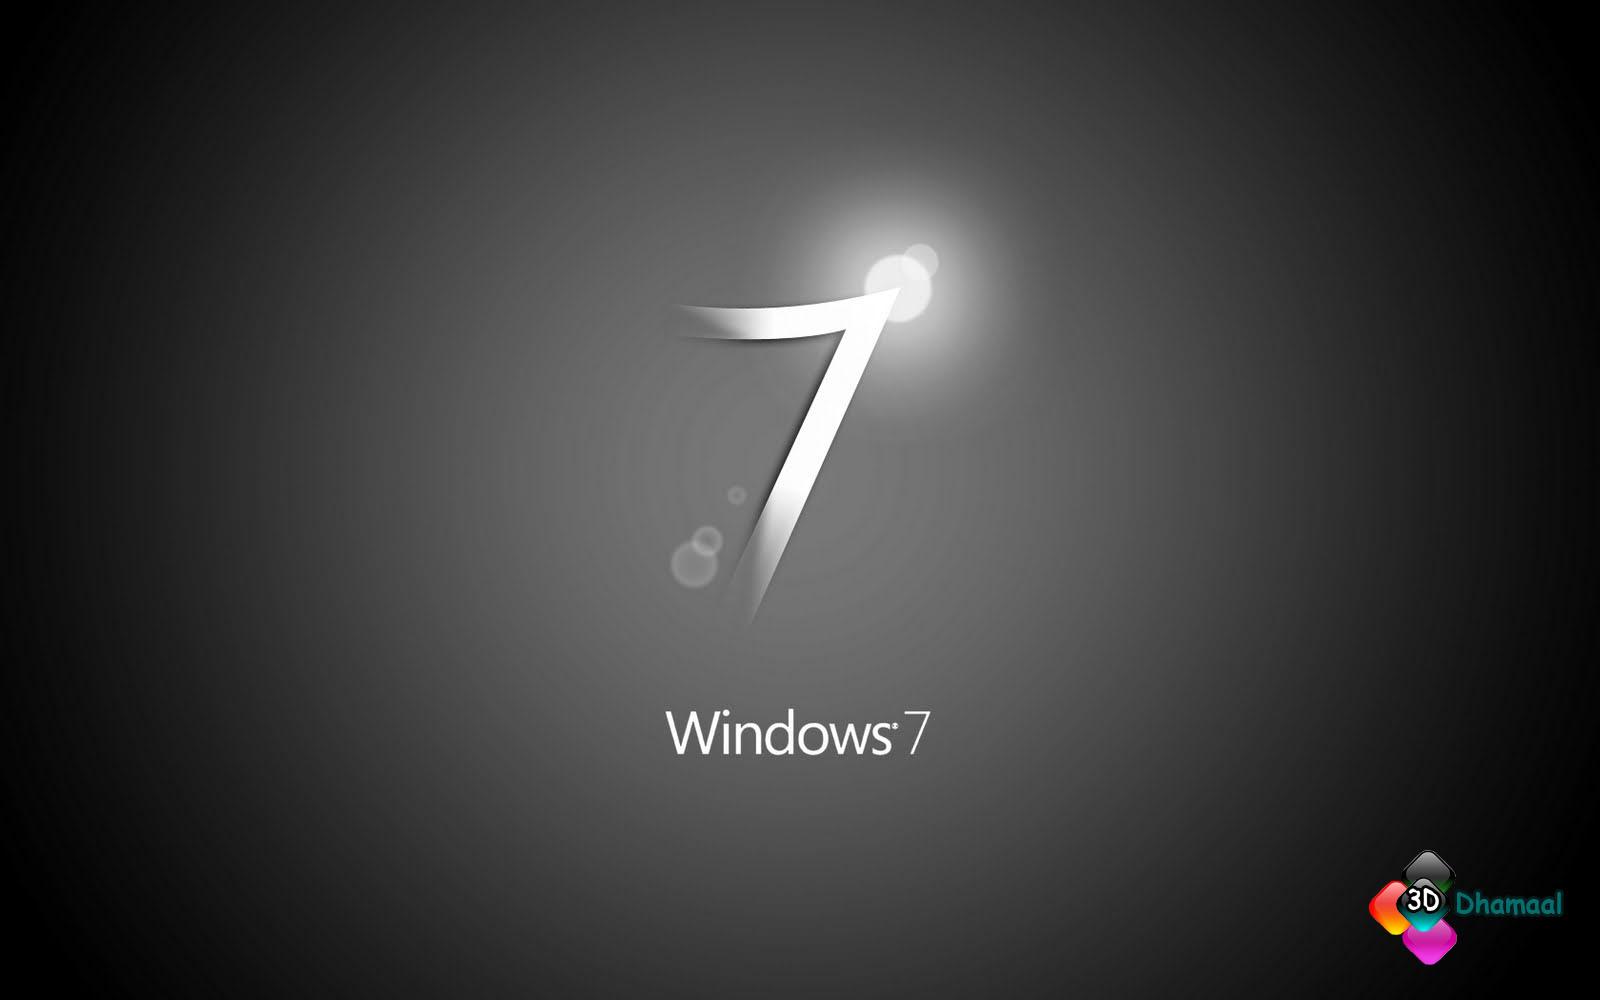 windows 7 black wallpaper hd 20 desktop wallpaper - hdblackwallpaper